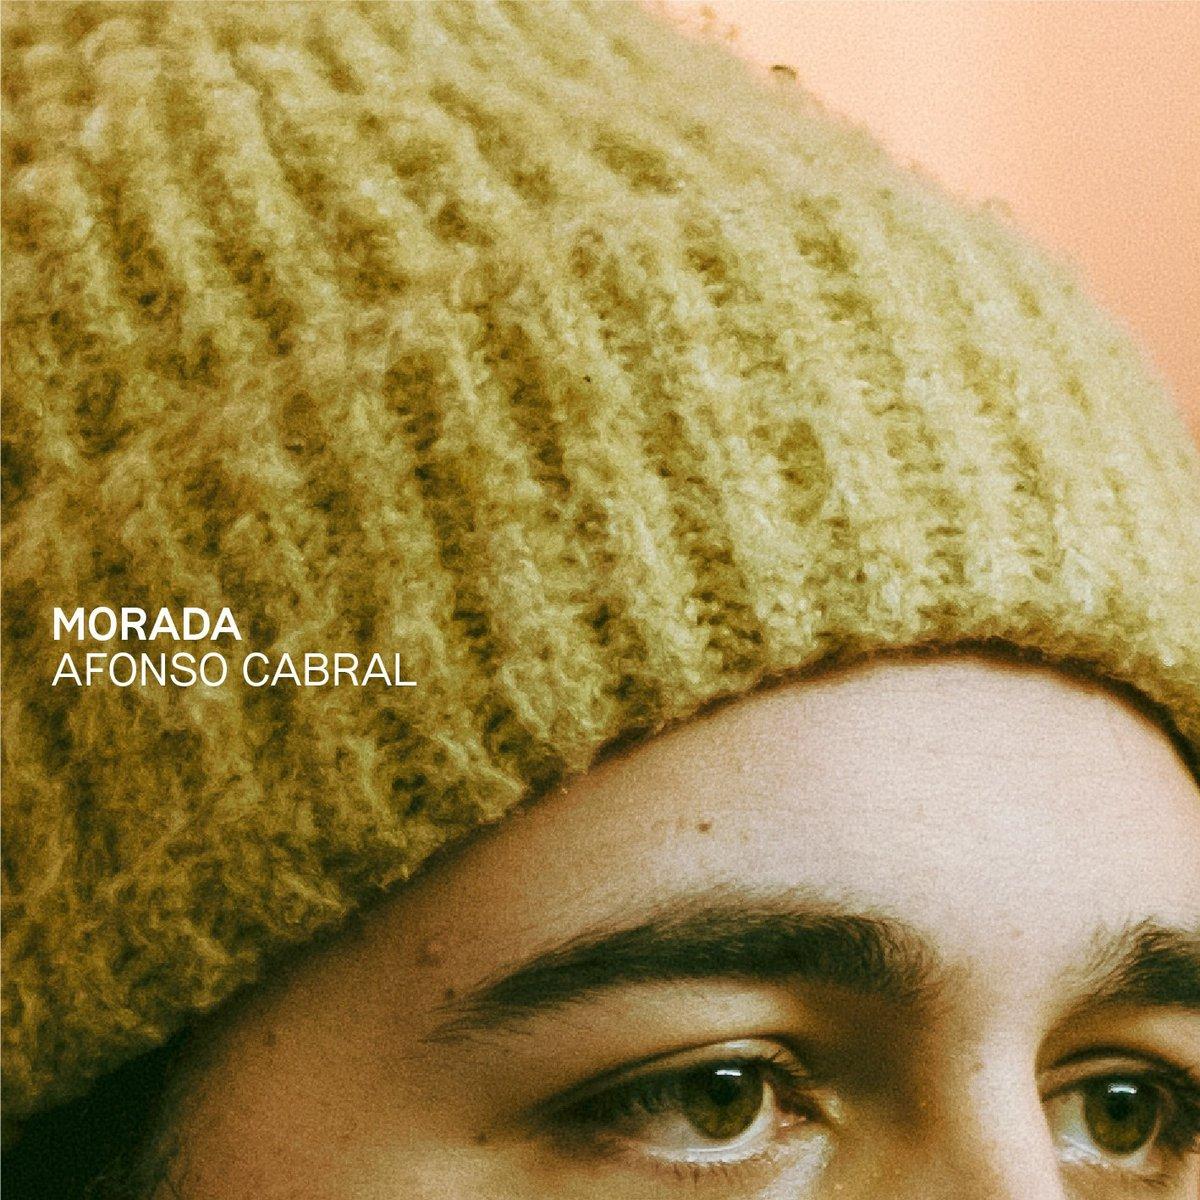 Image of Morada